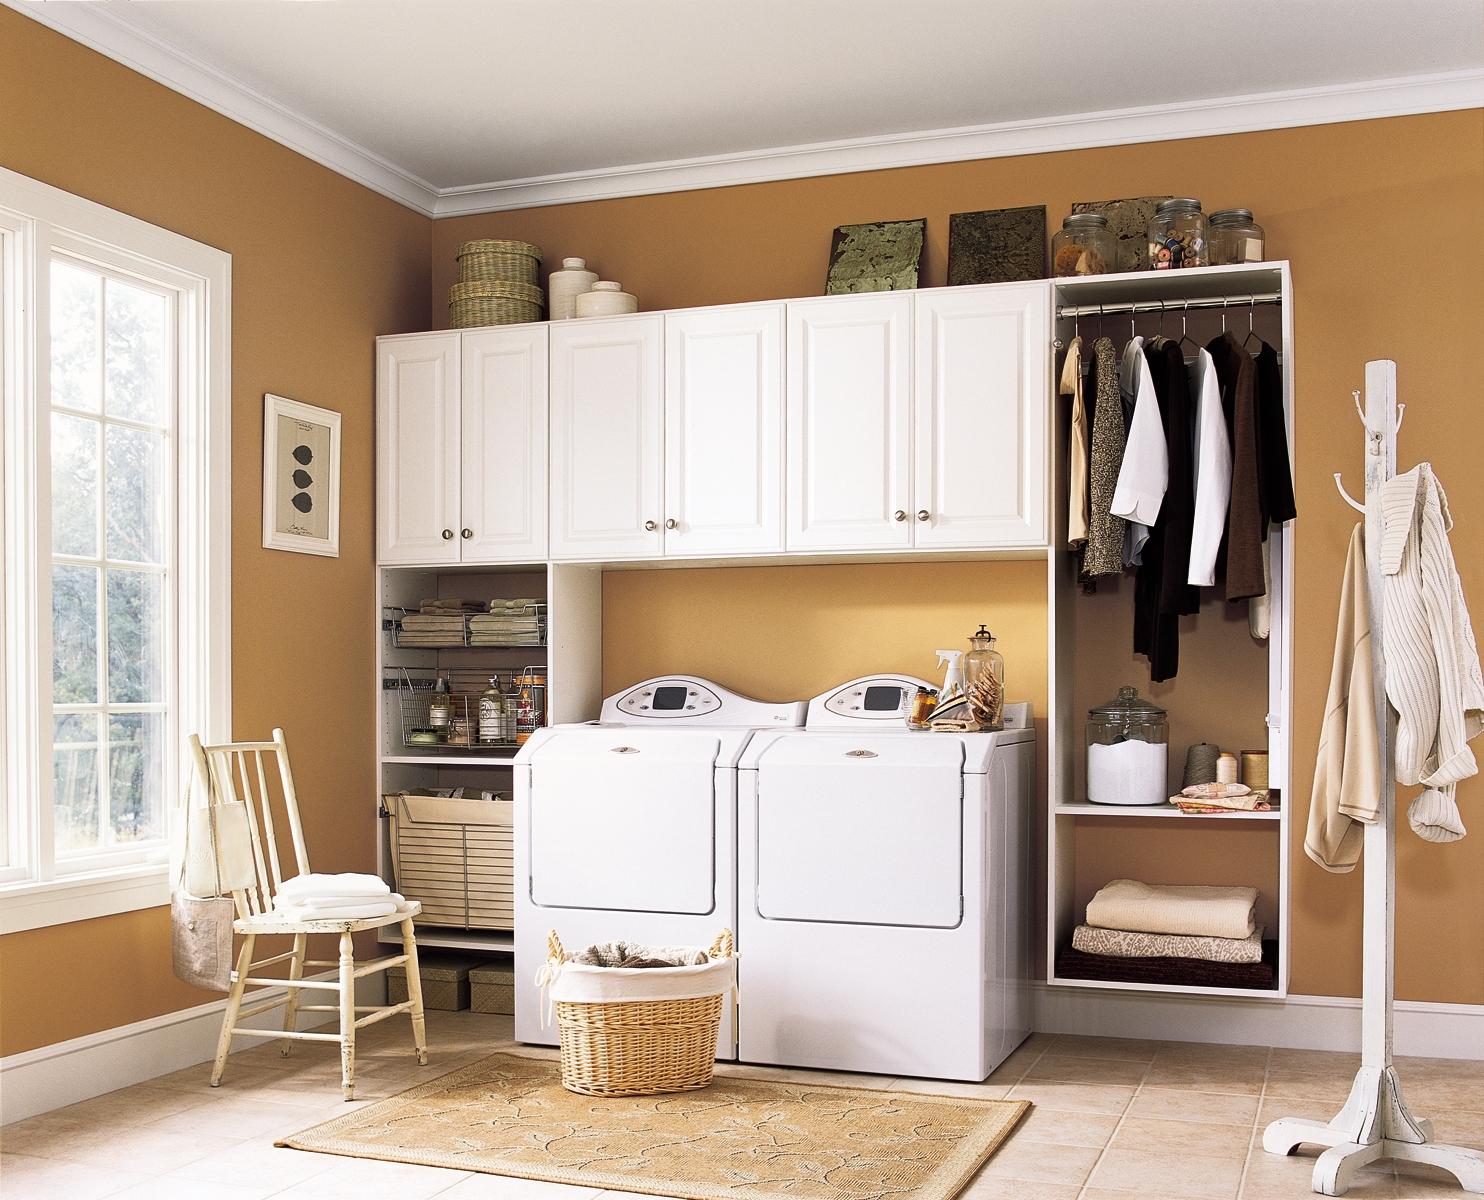 I Dream of Laundry Rooms   Apartments i Like blog on Laundry Room Decor  id=15595